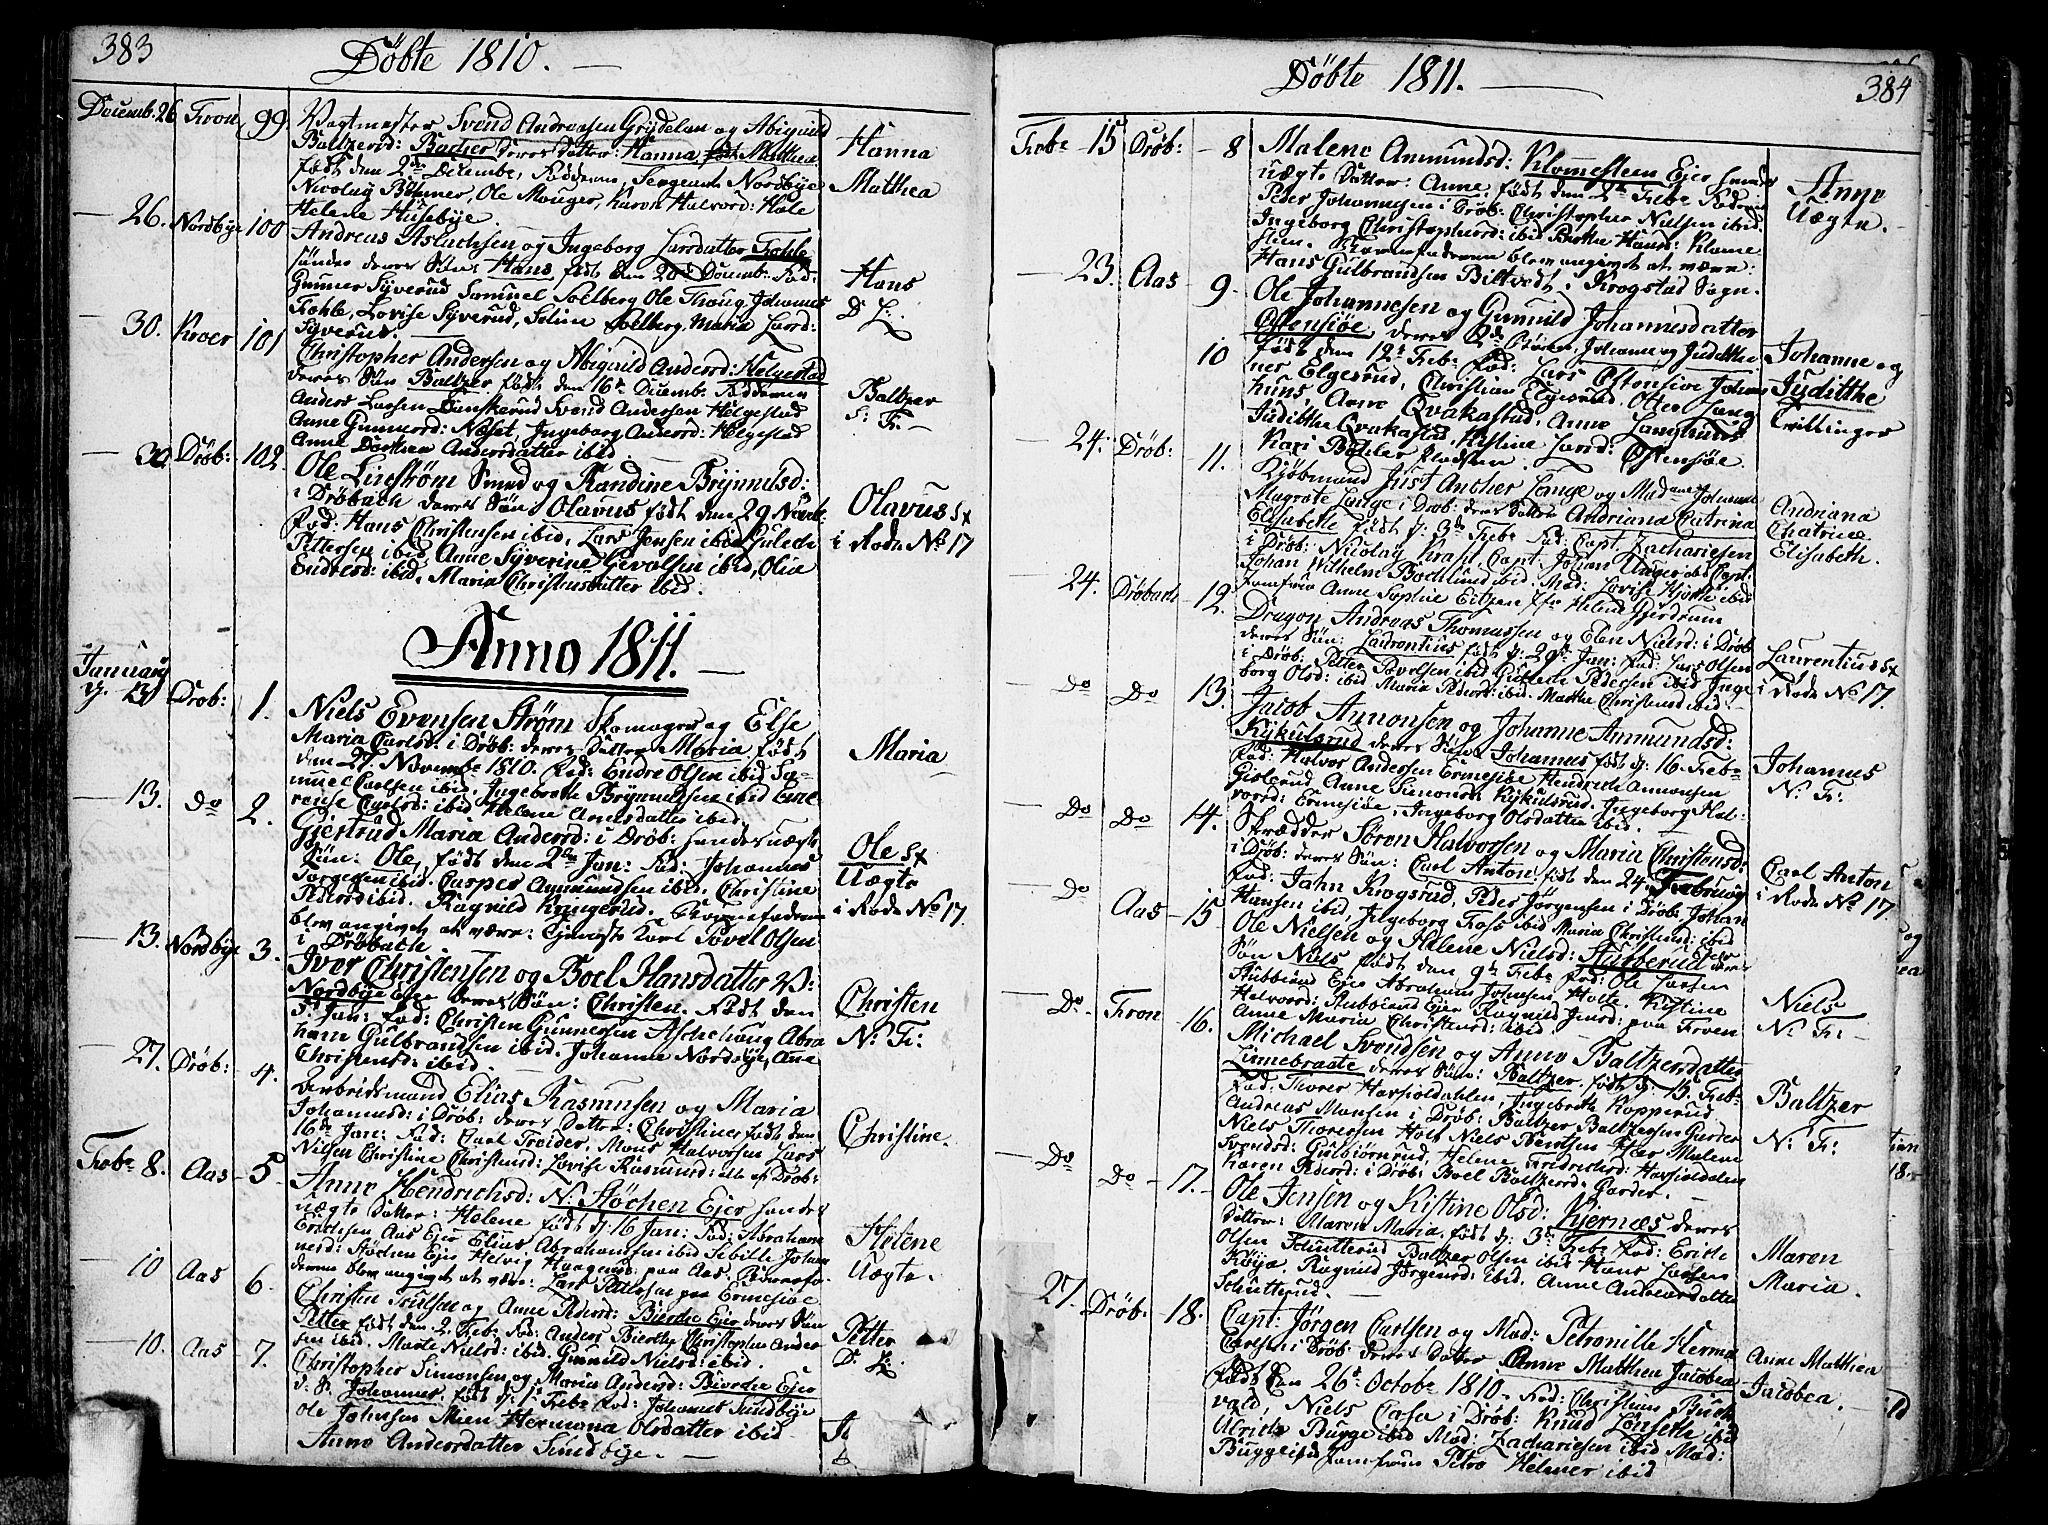 SAO, Ås prestekontor Kirkebøker, F/Fa/L0002: Ministerialbok nr. I 2, 1778-1813, s. 383-384